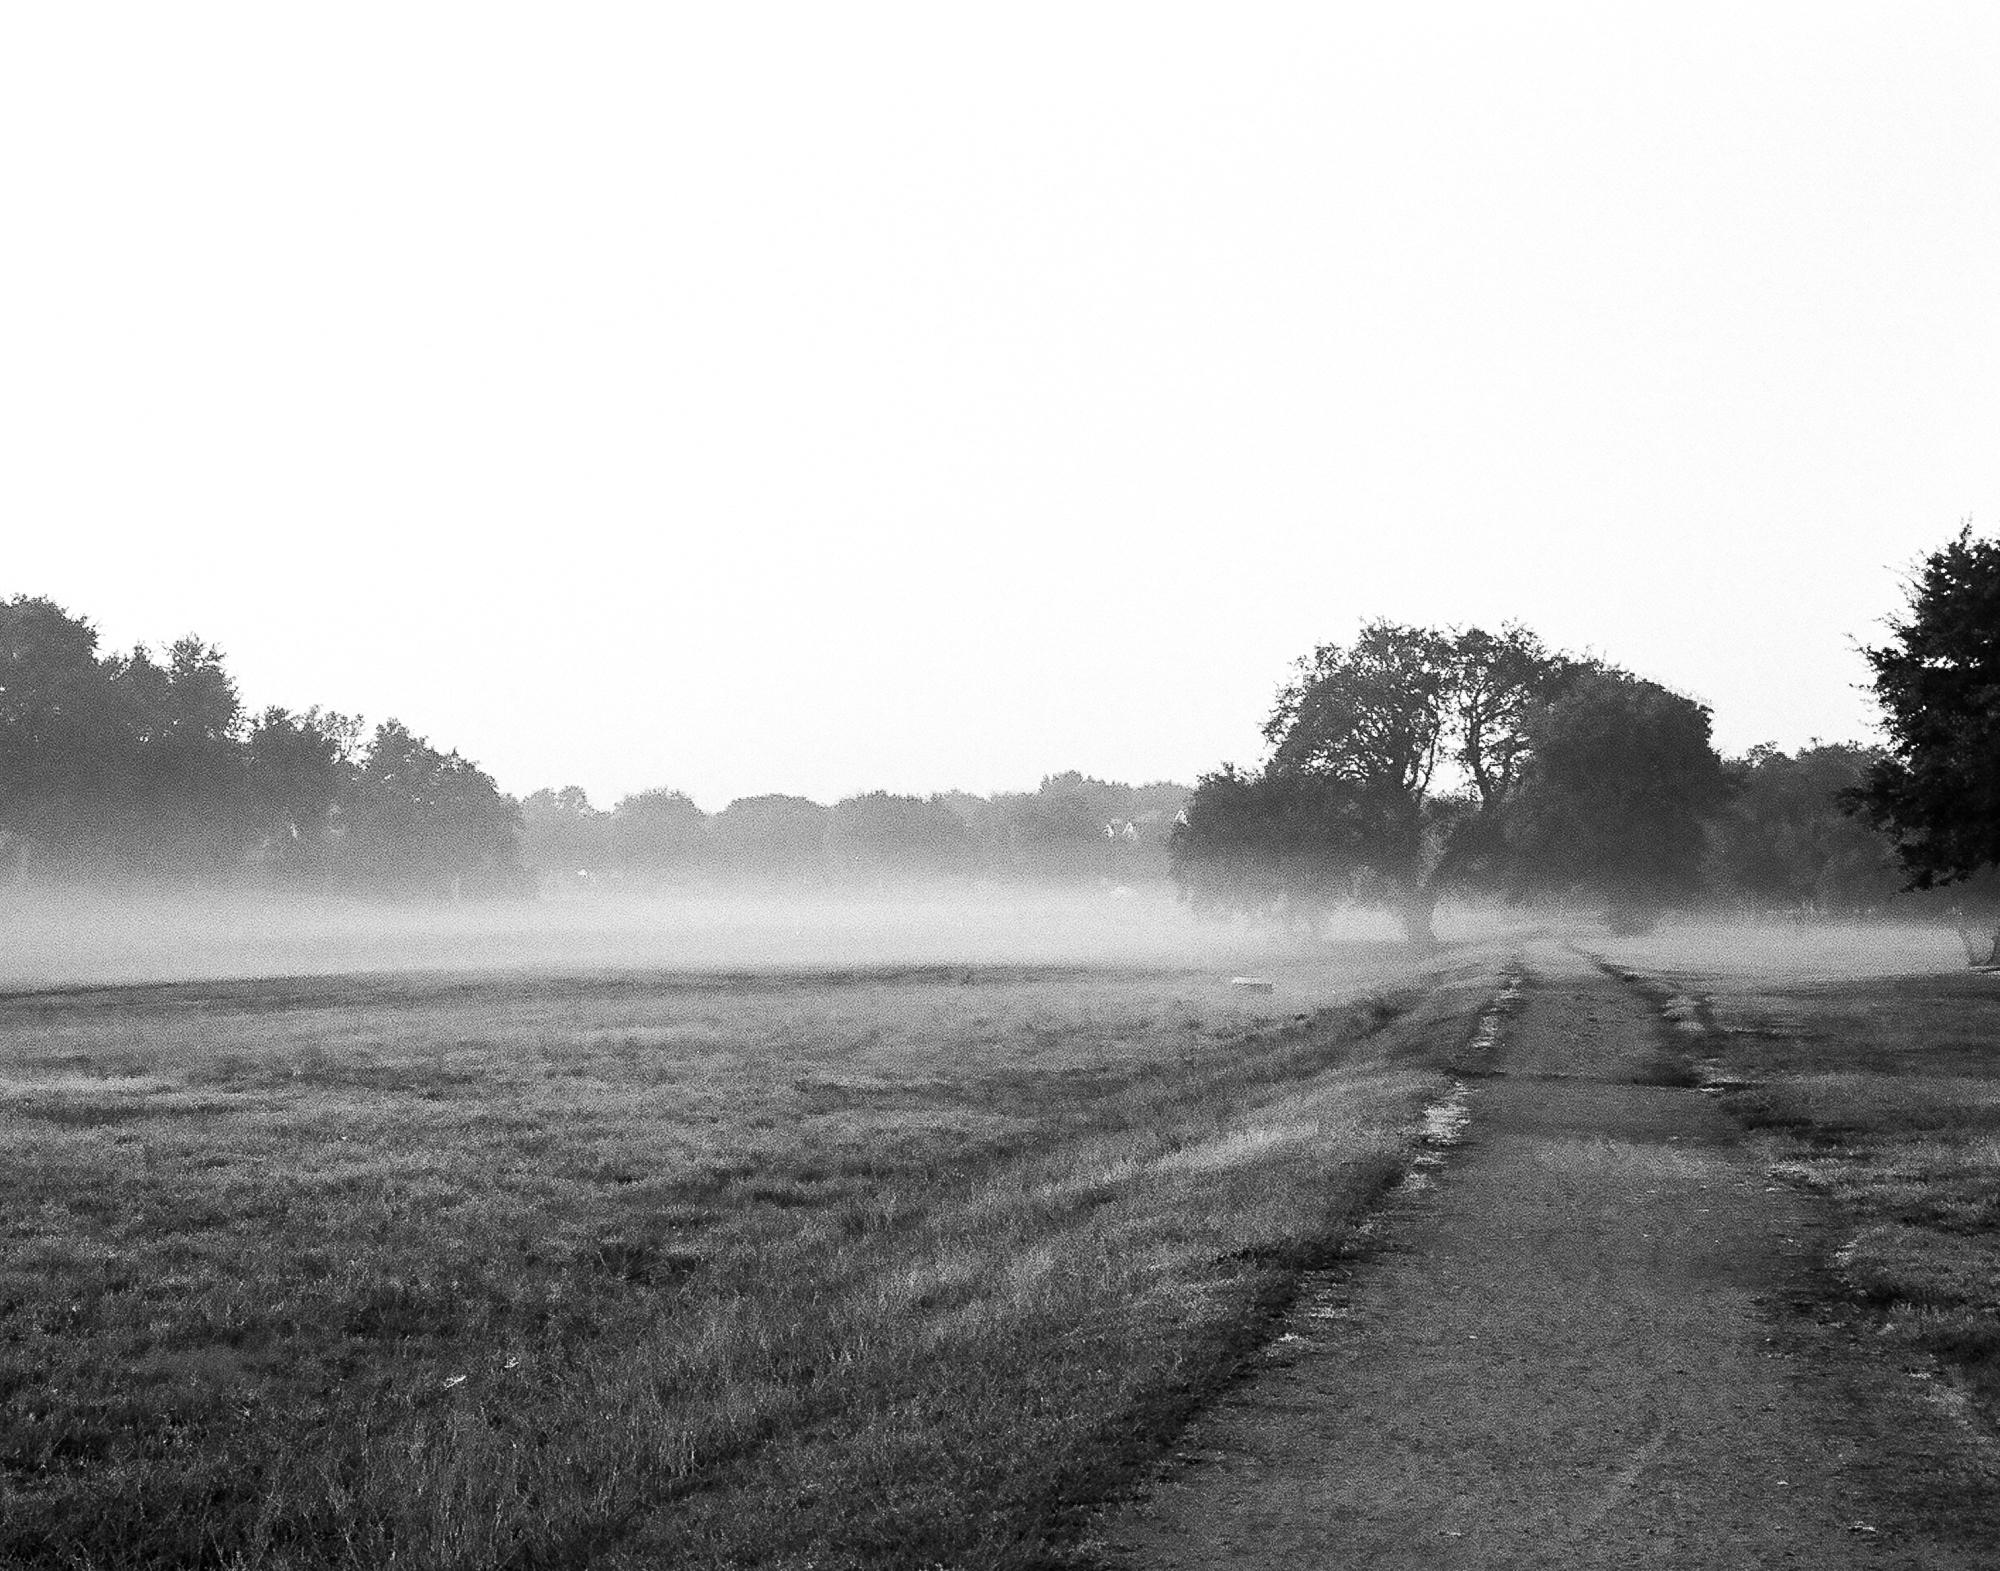 morning mist |Chris Ullrich